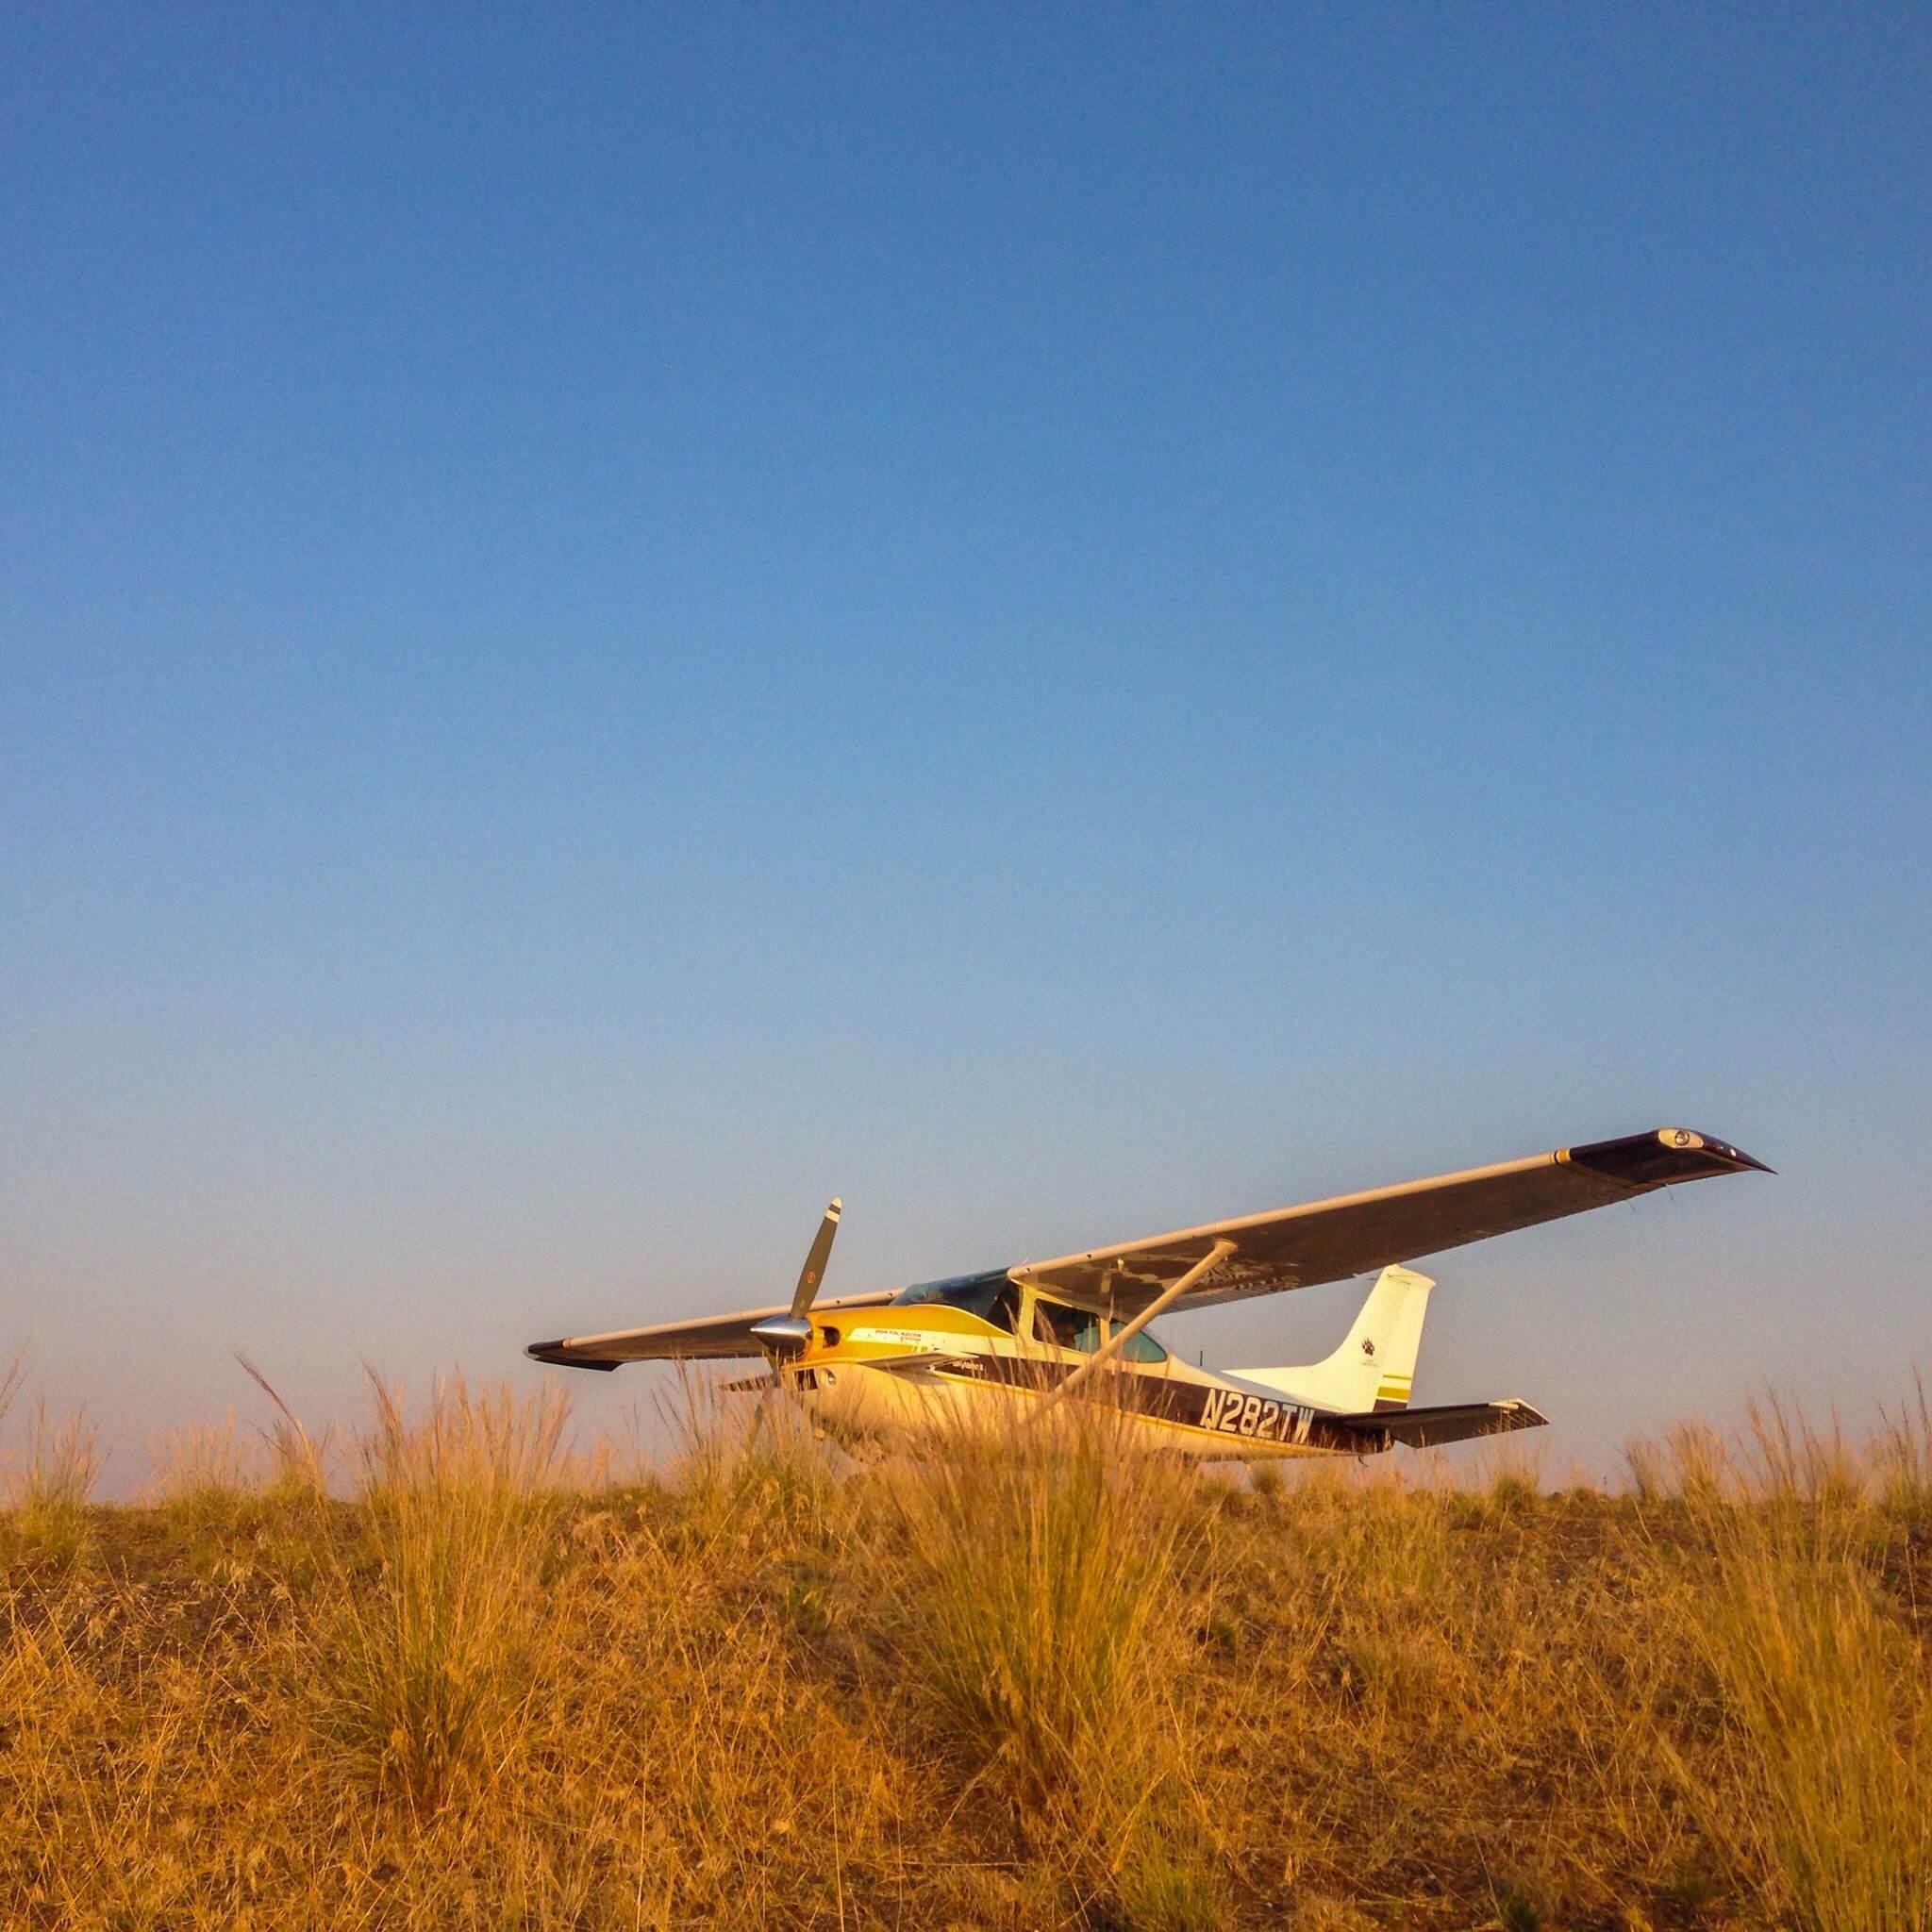 Aircraft of the Week - Cessna 182 STOL Kit